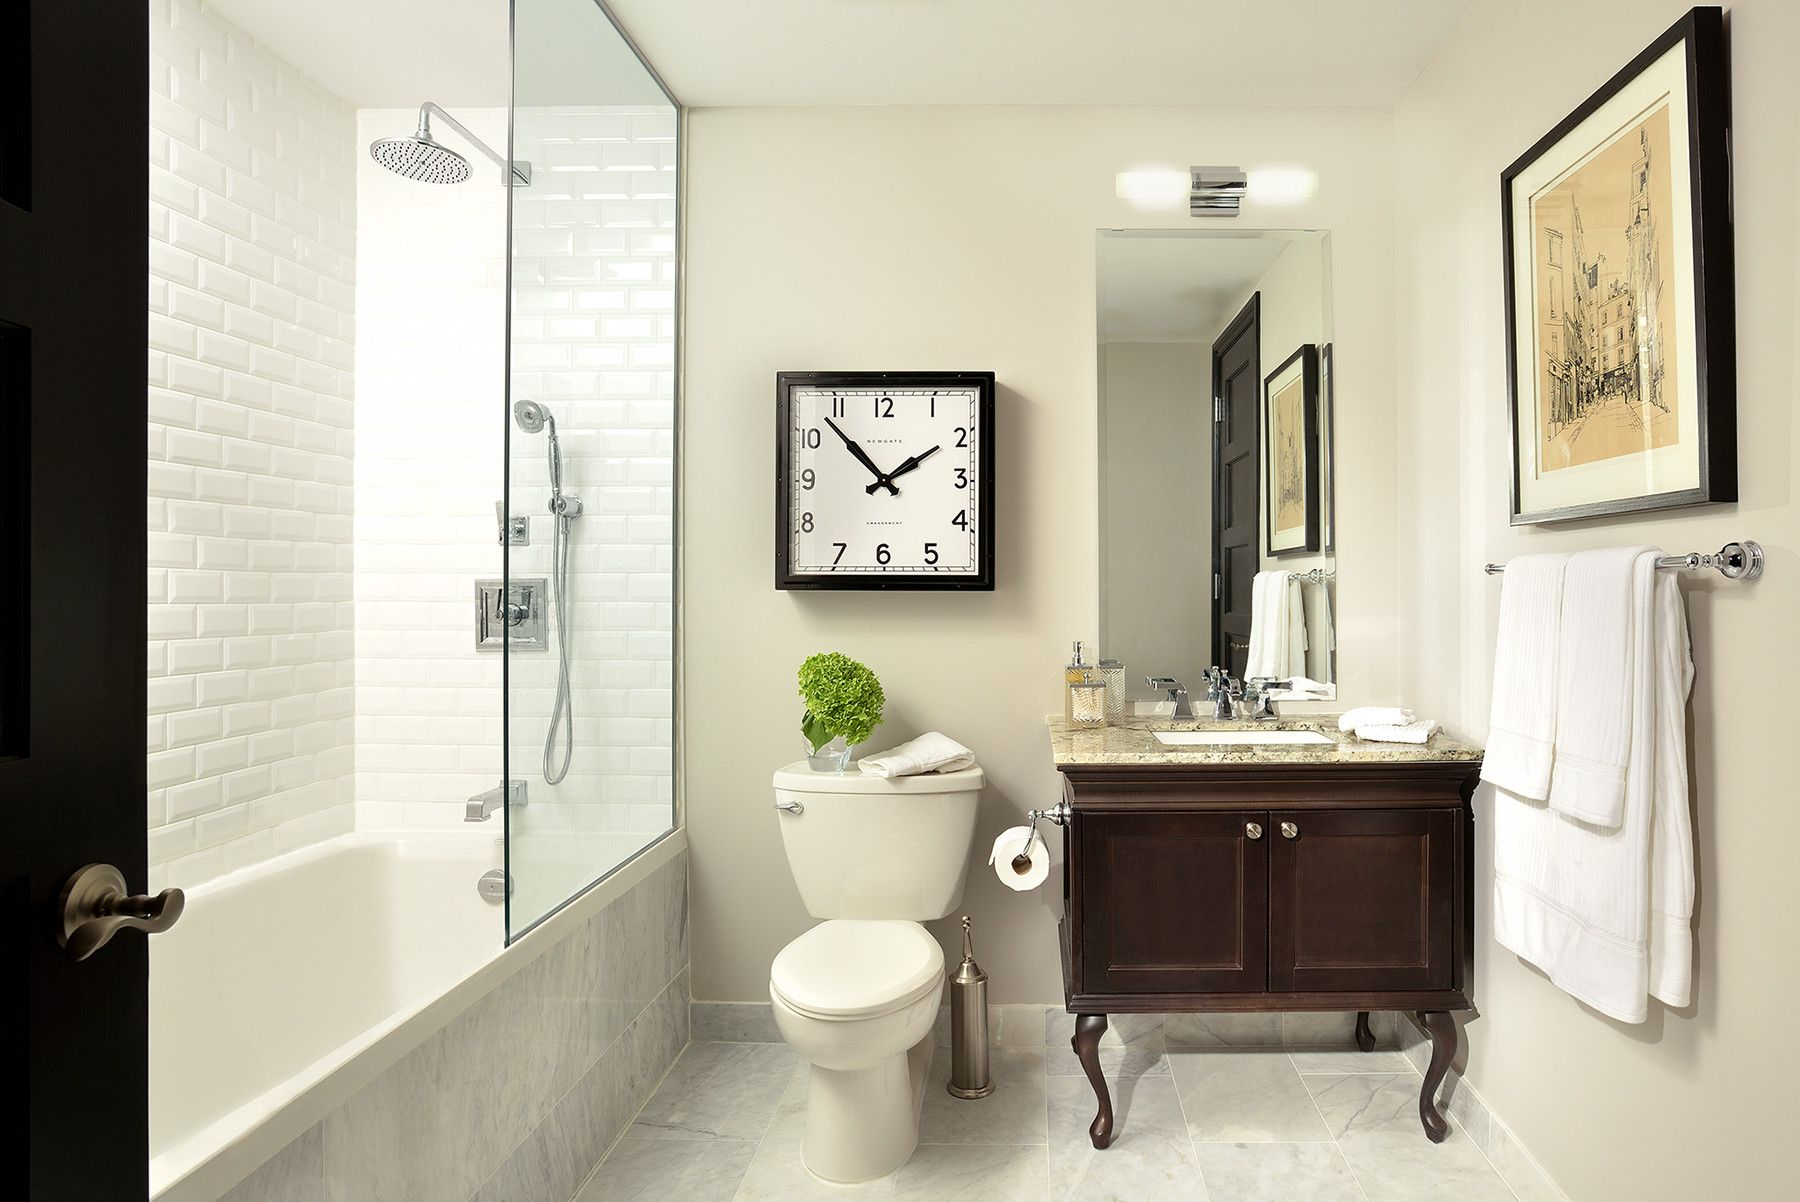 Bathroom Space Designed By Glen U0026 Jamie From Peloso Alexander Interiors.  #GlenandJamie #Design